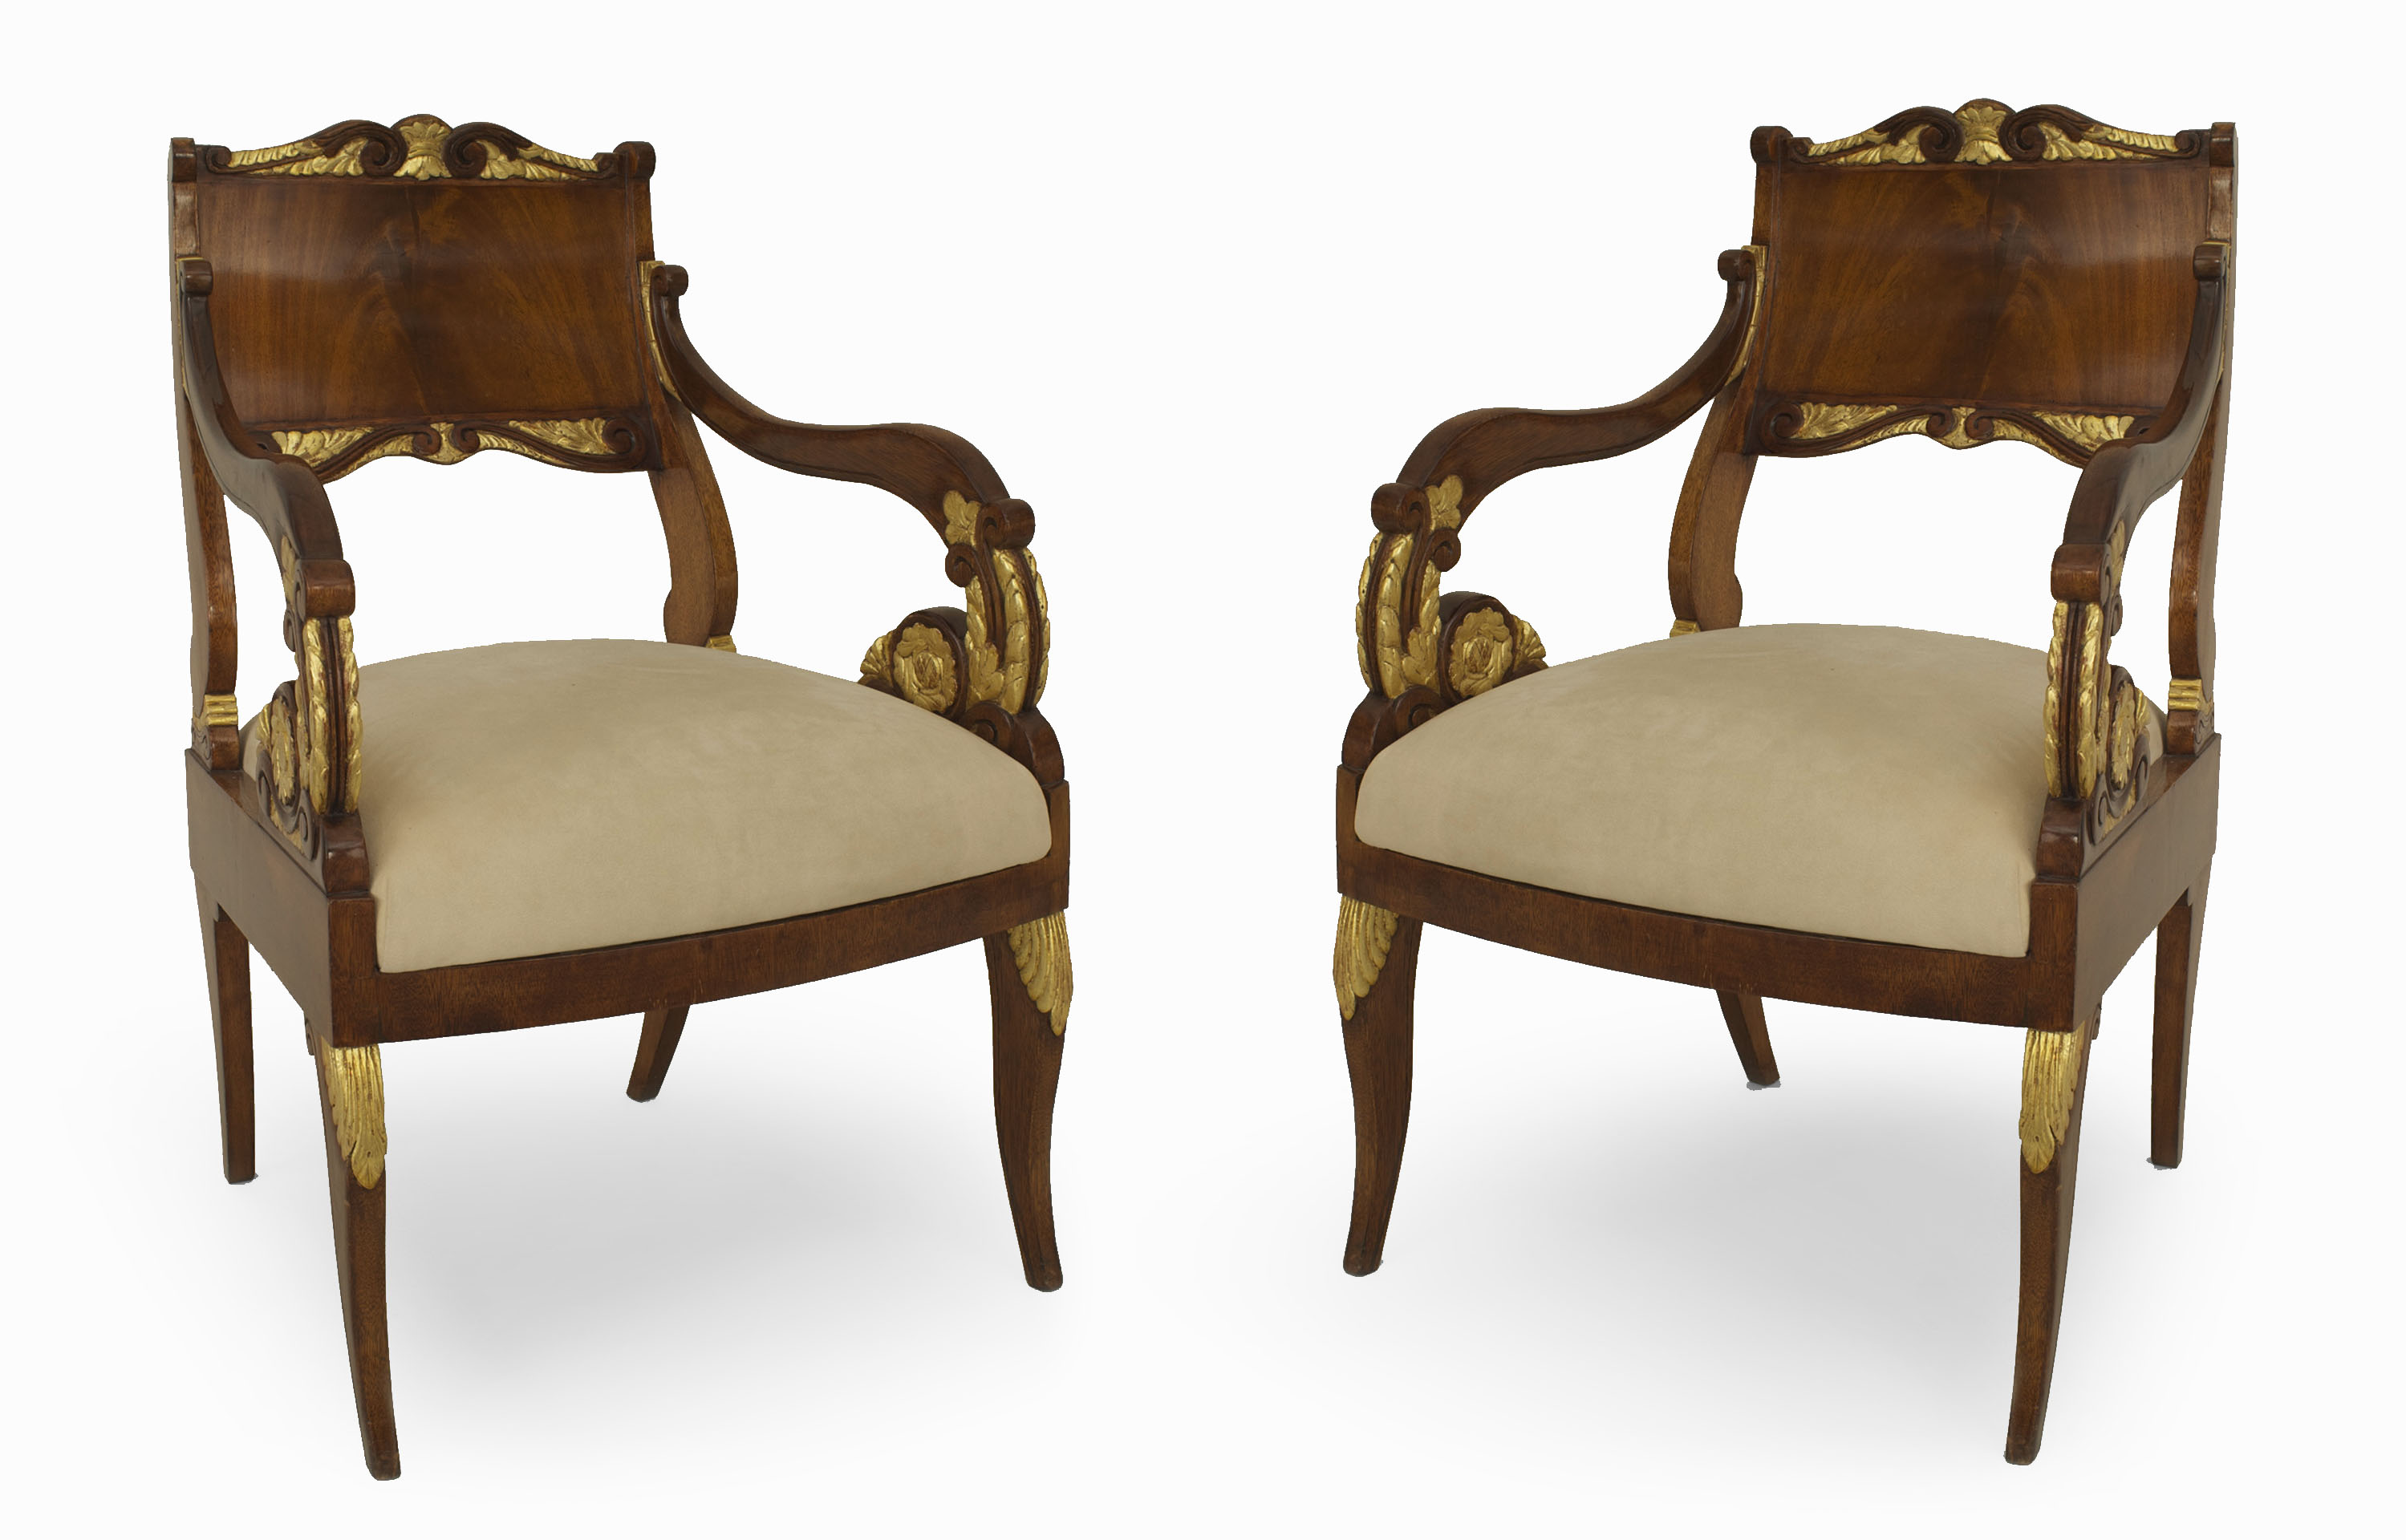 Russian Mahogany Scroll Arm Chairs